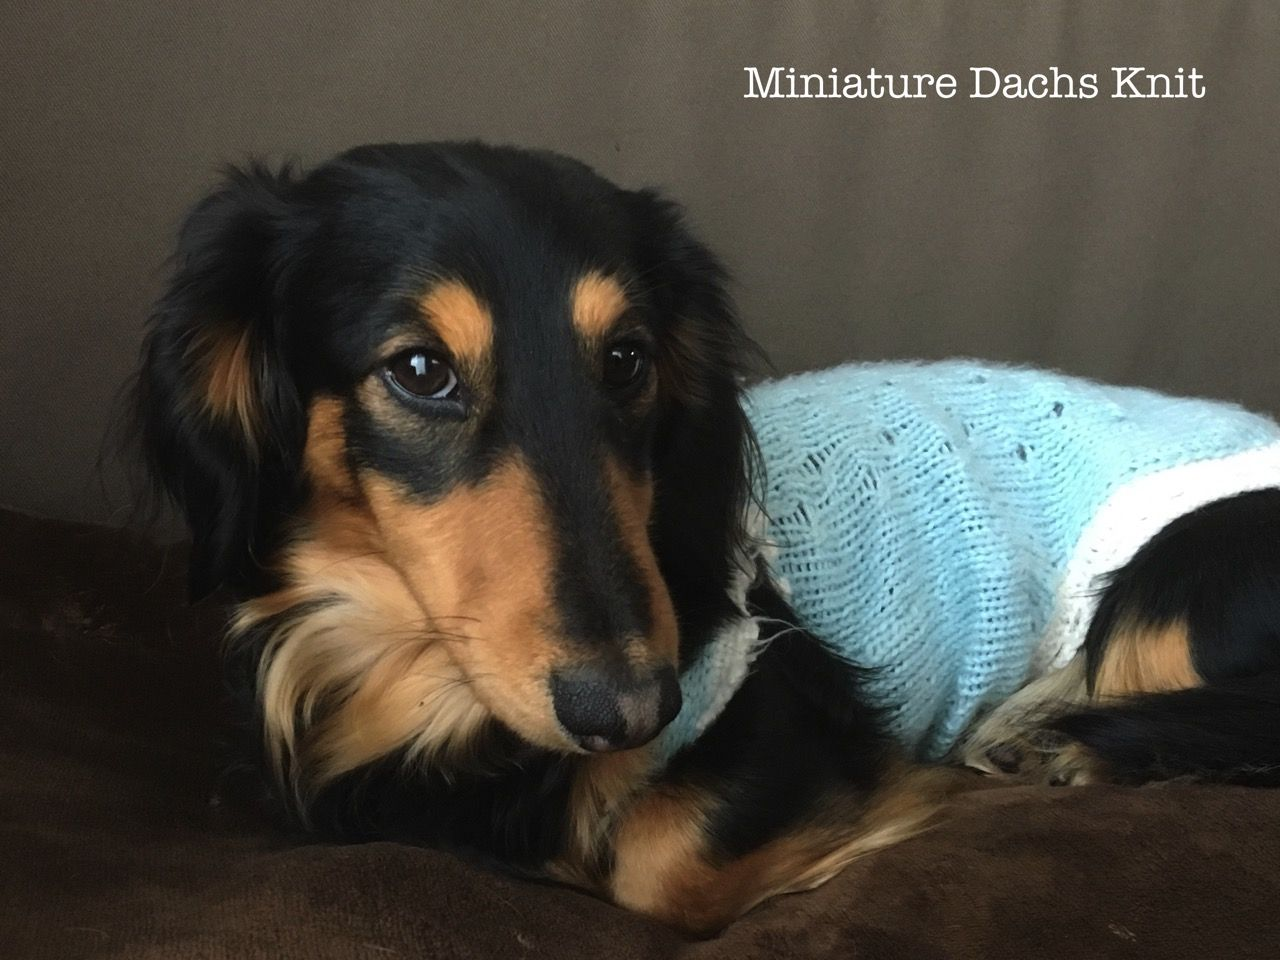 Miniature Dachs Knit